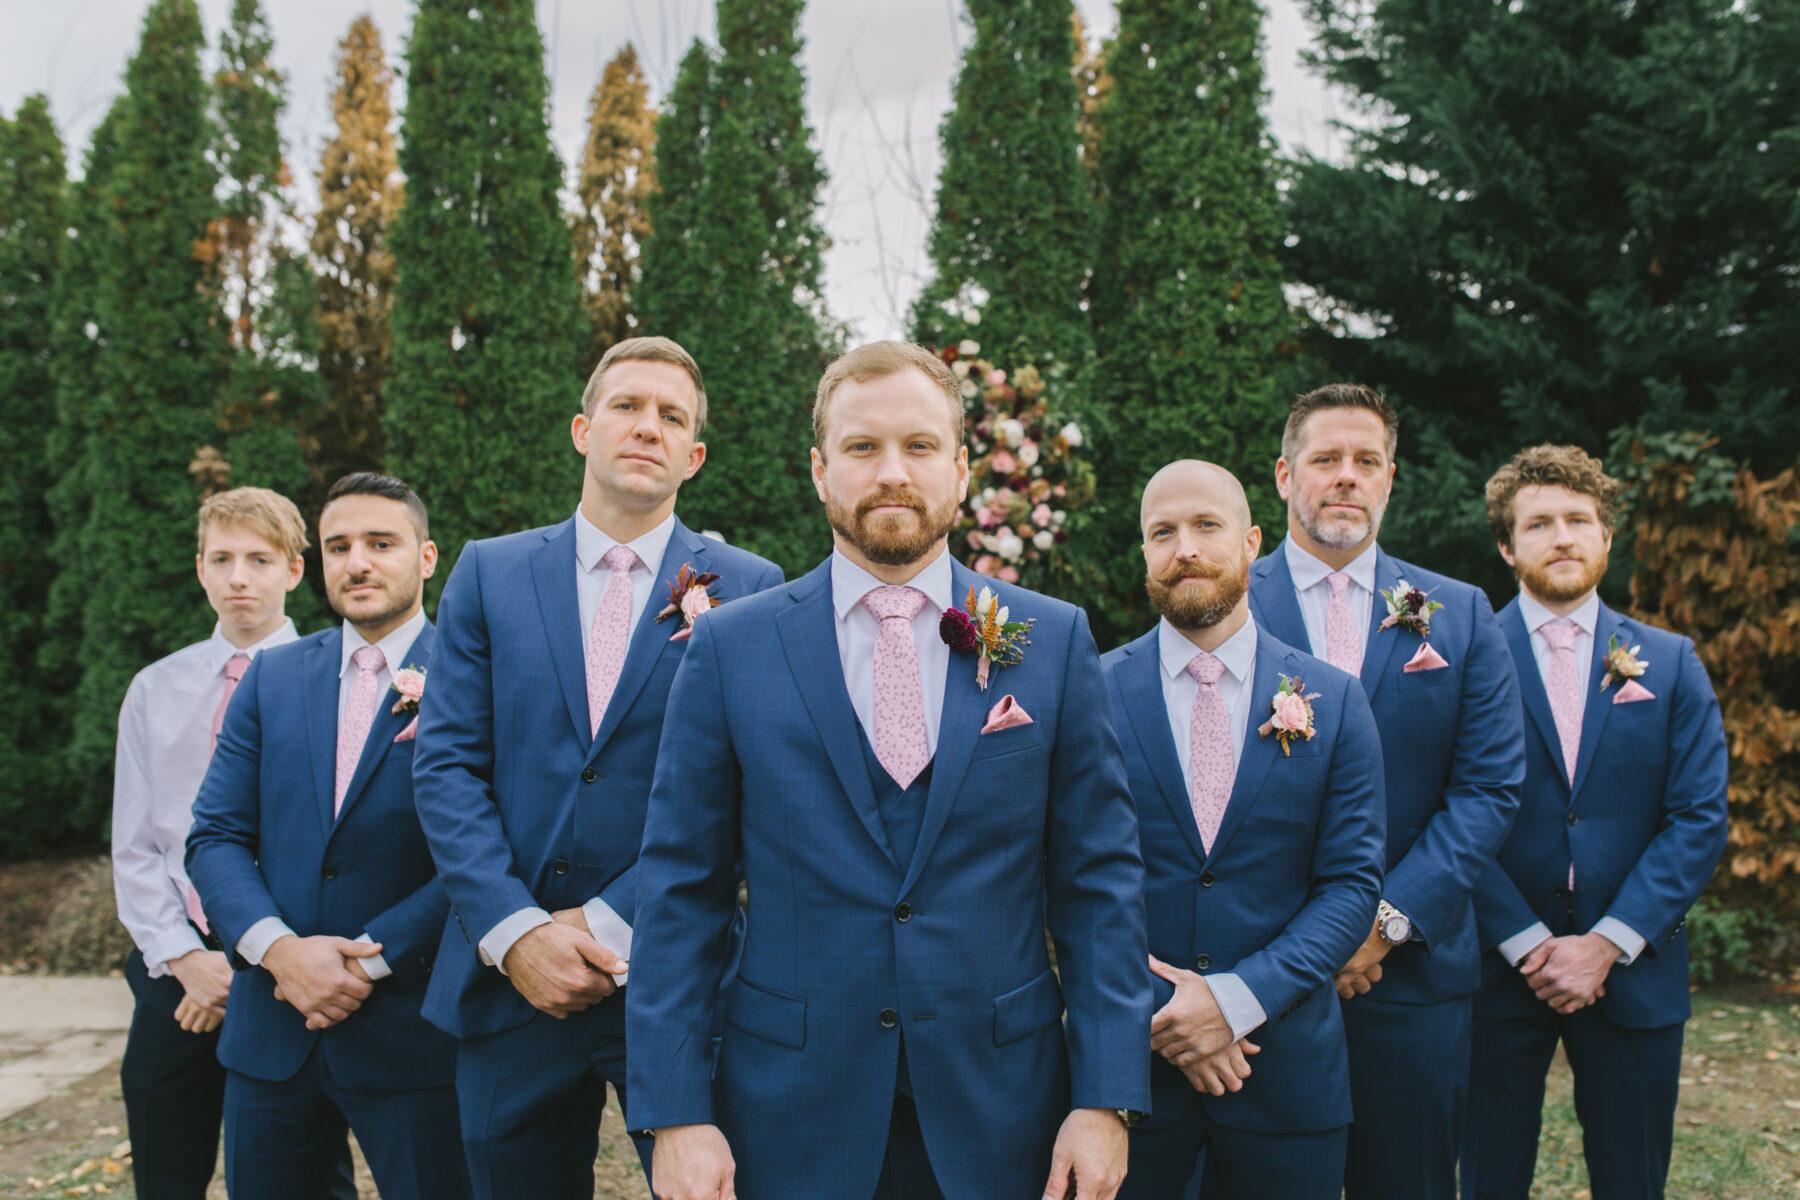 Blue Groom's Attire with Pink Tie | Nashville Bride Guide